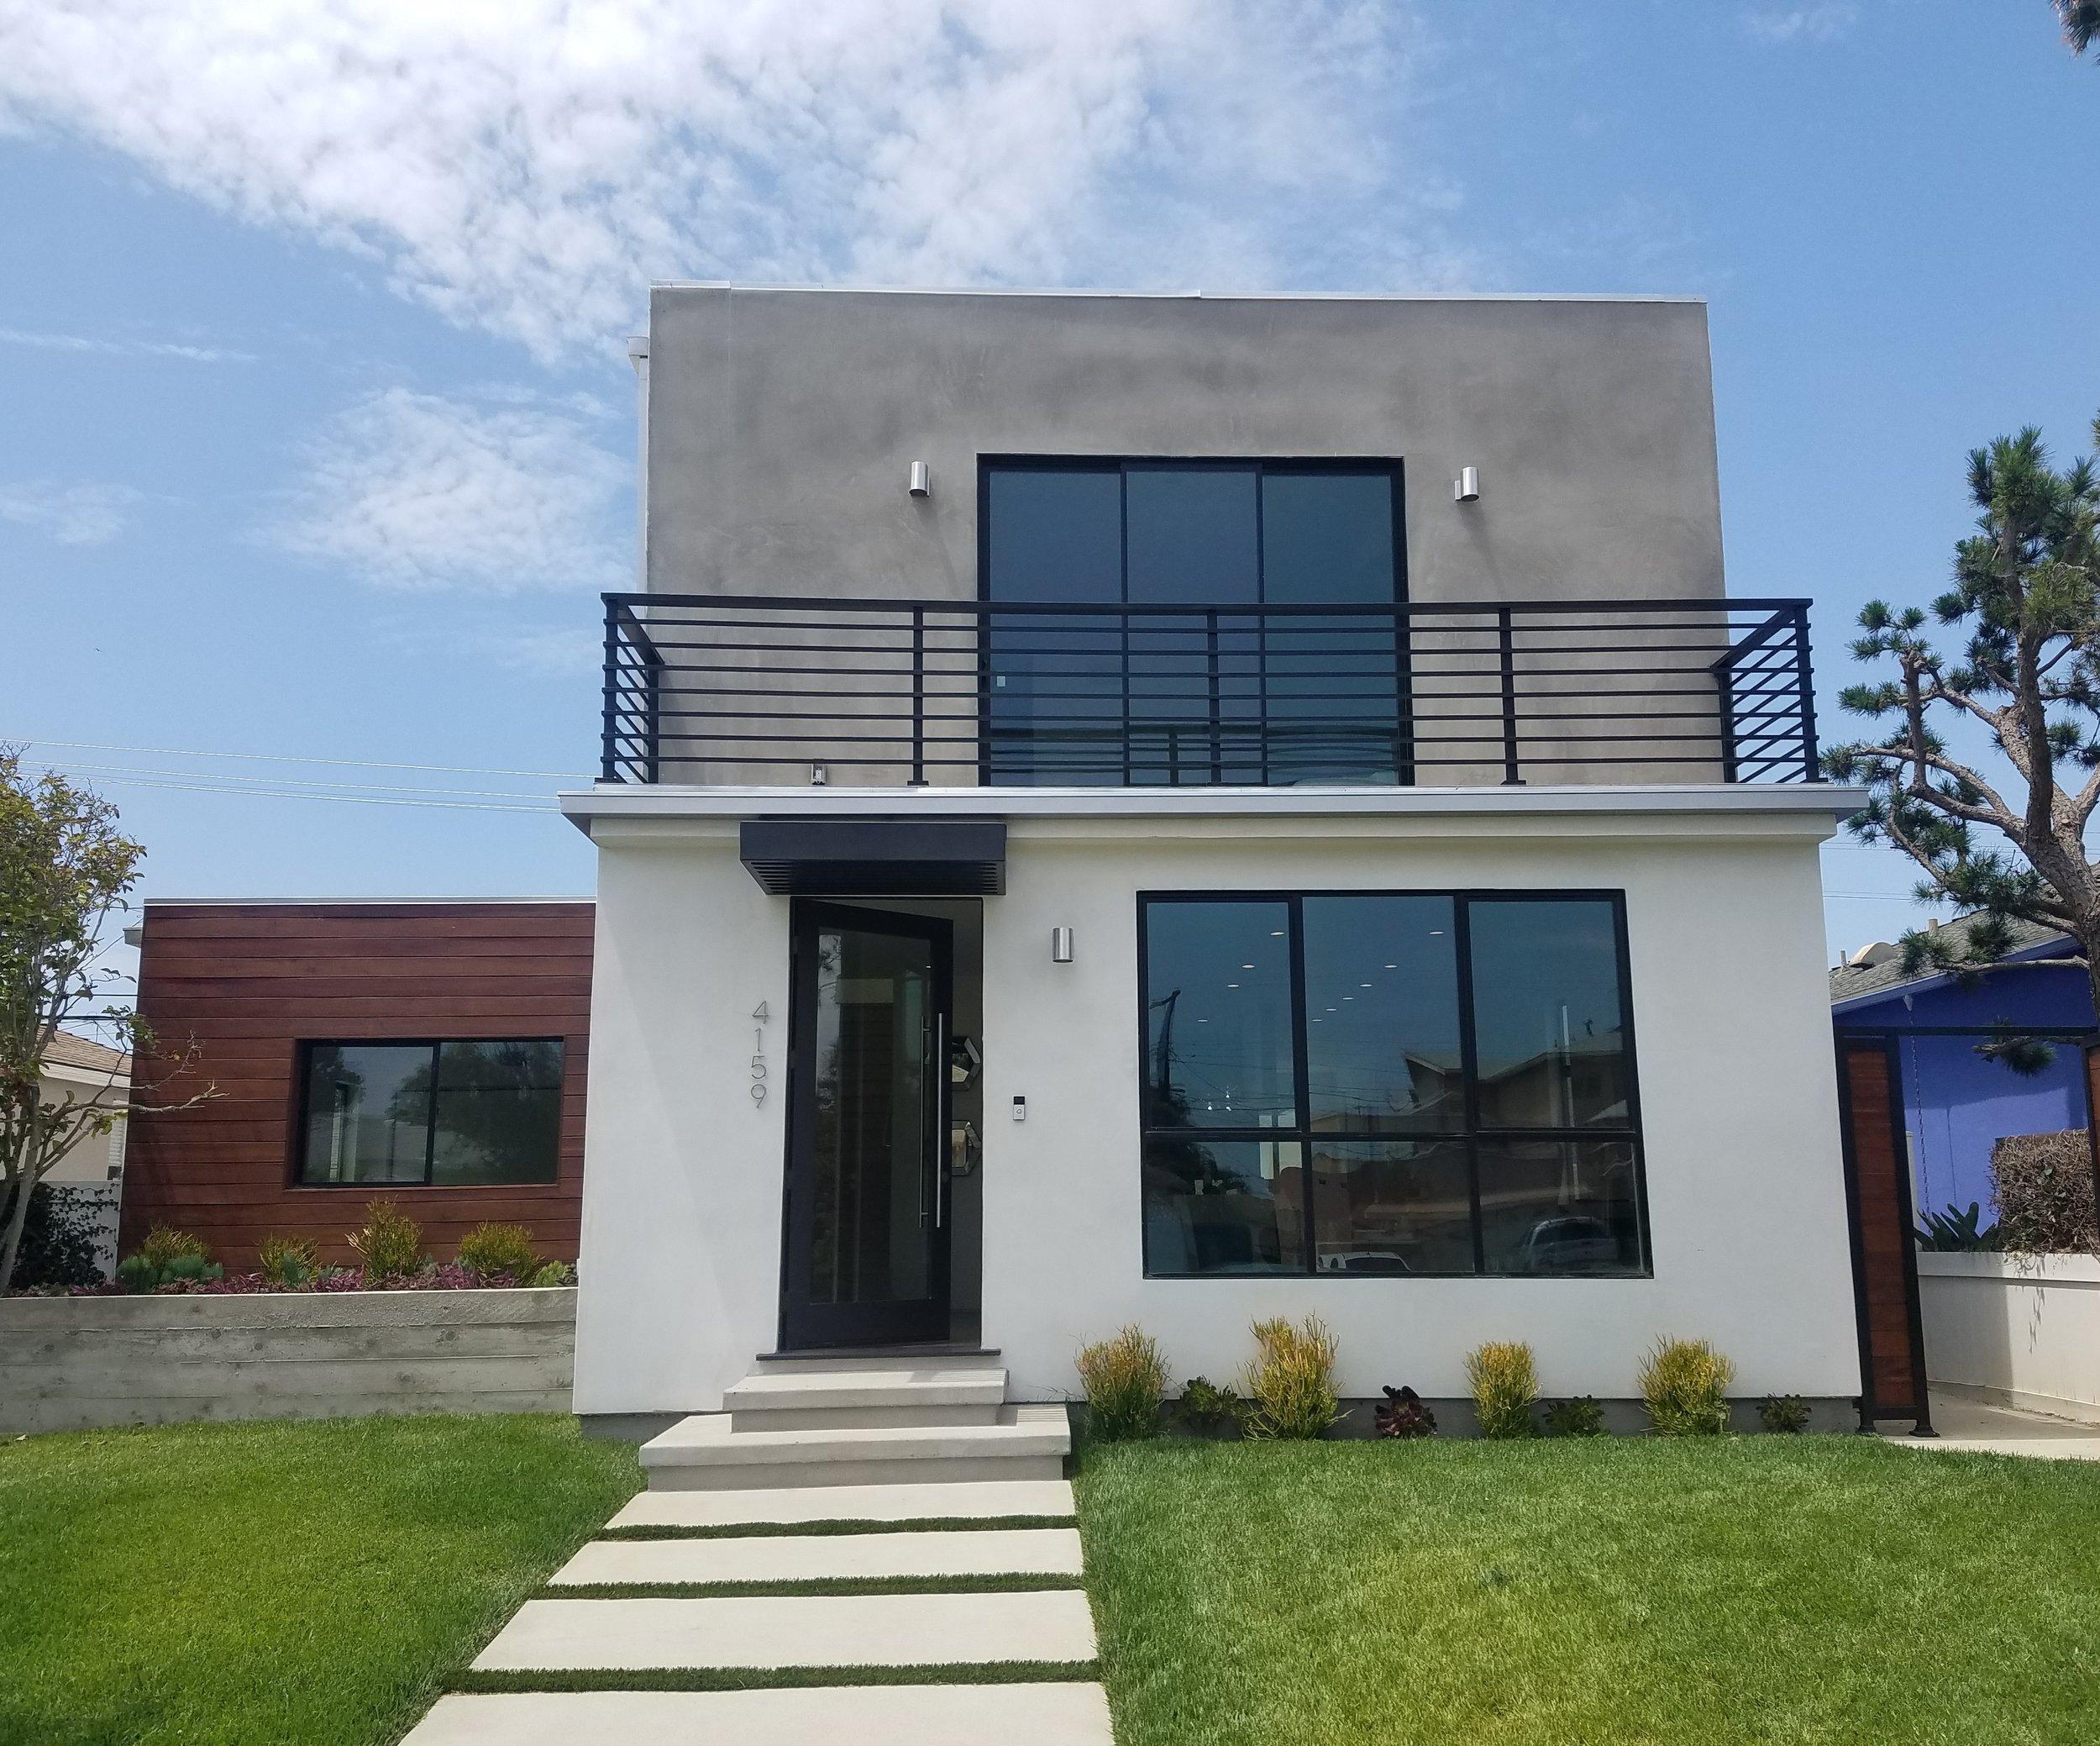 4159 Lyceum Ave | Del Rey | Offered at $2,249,900